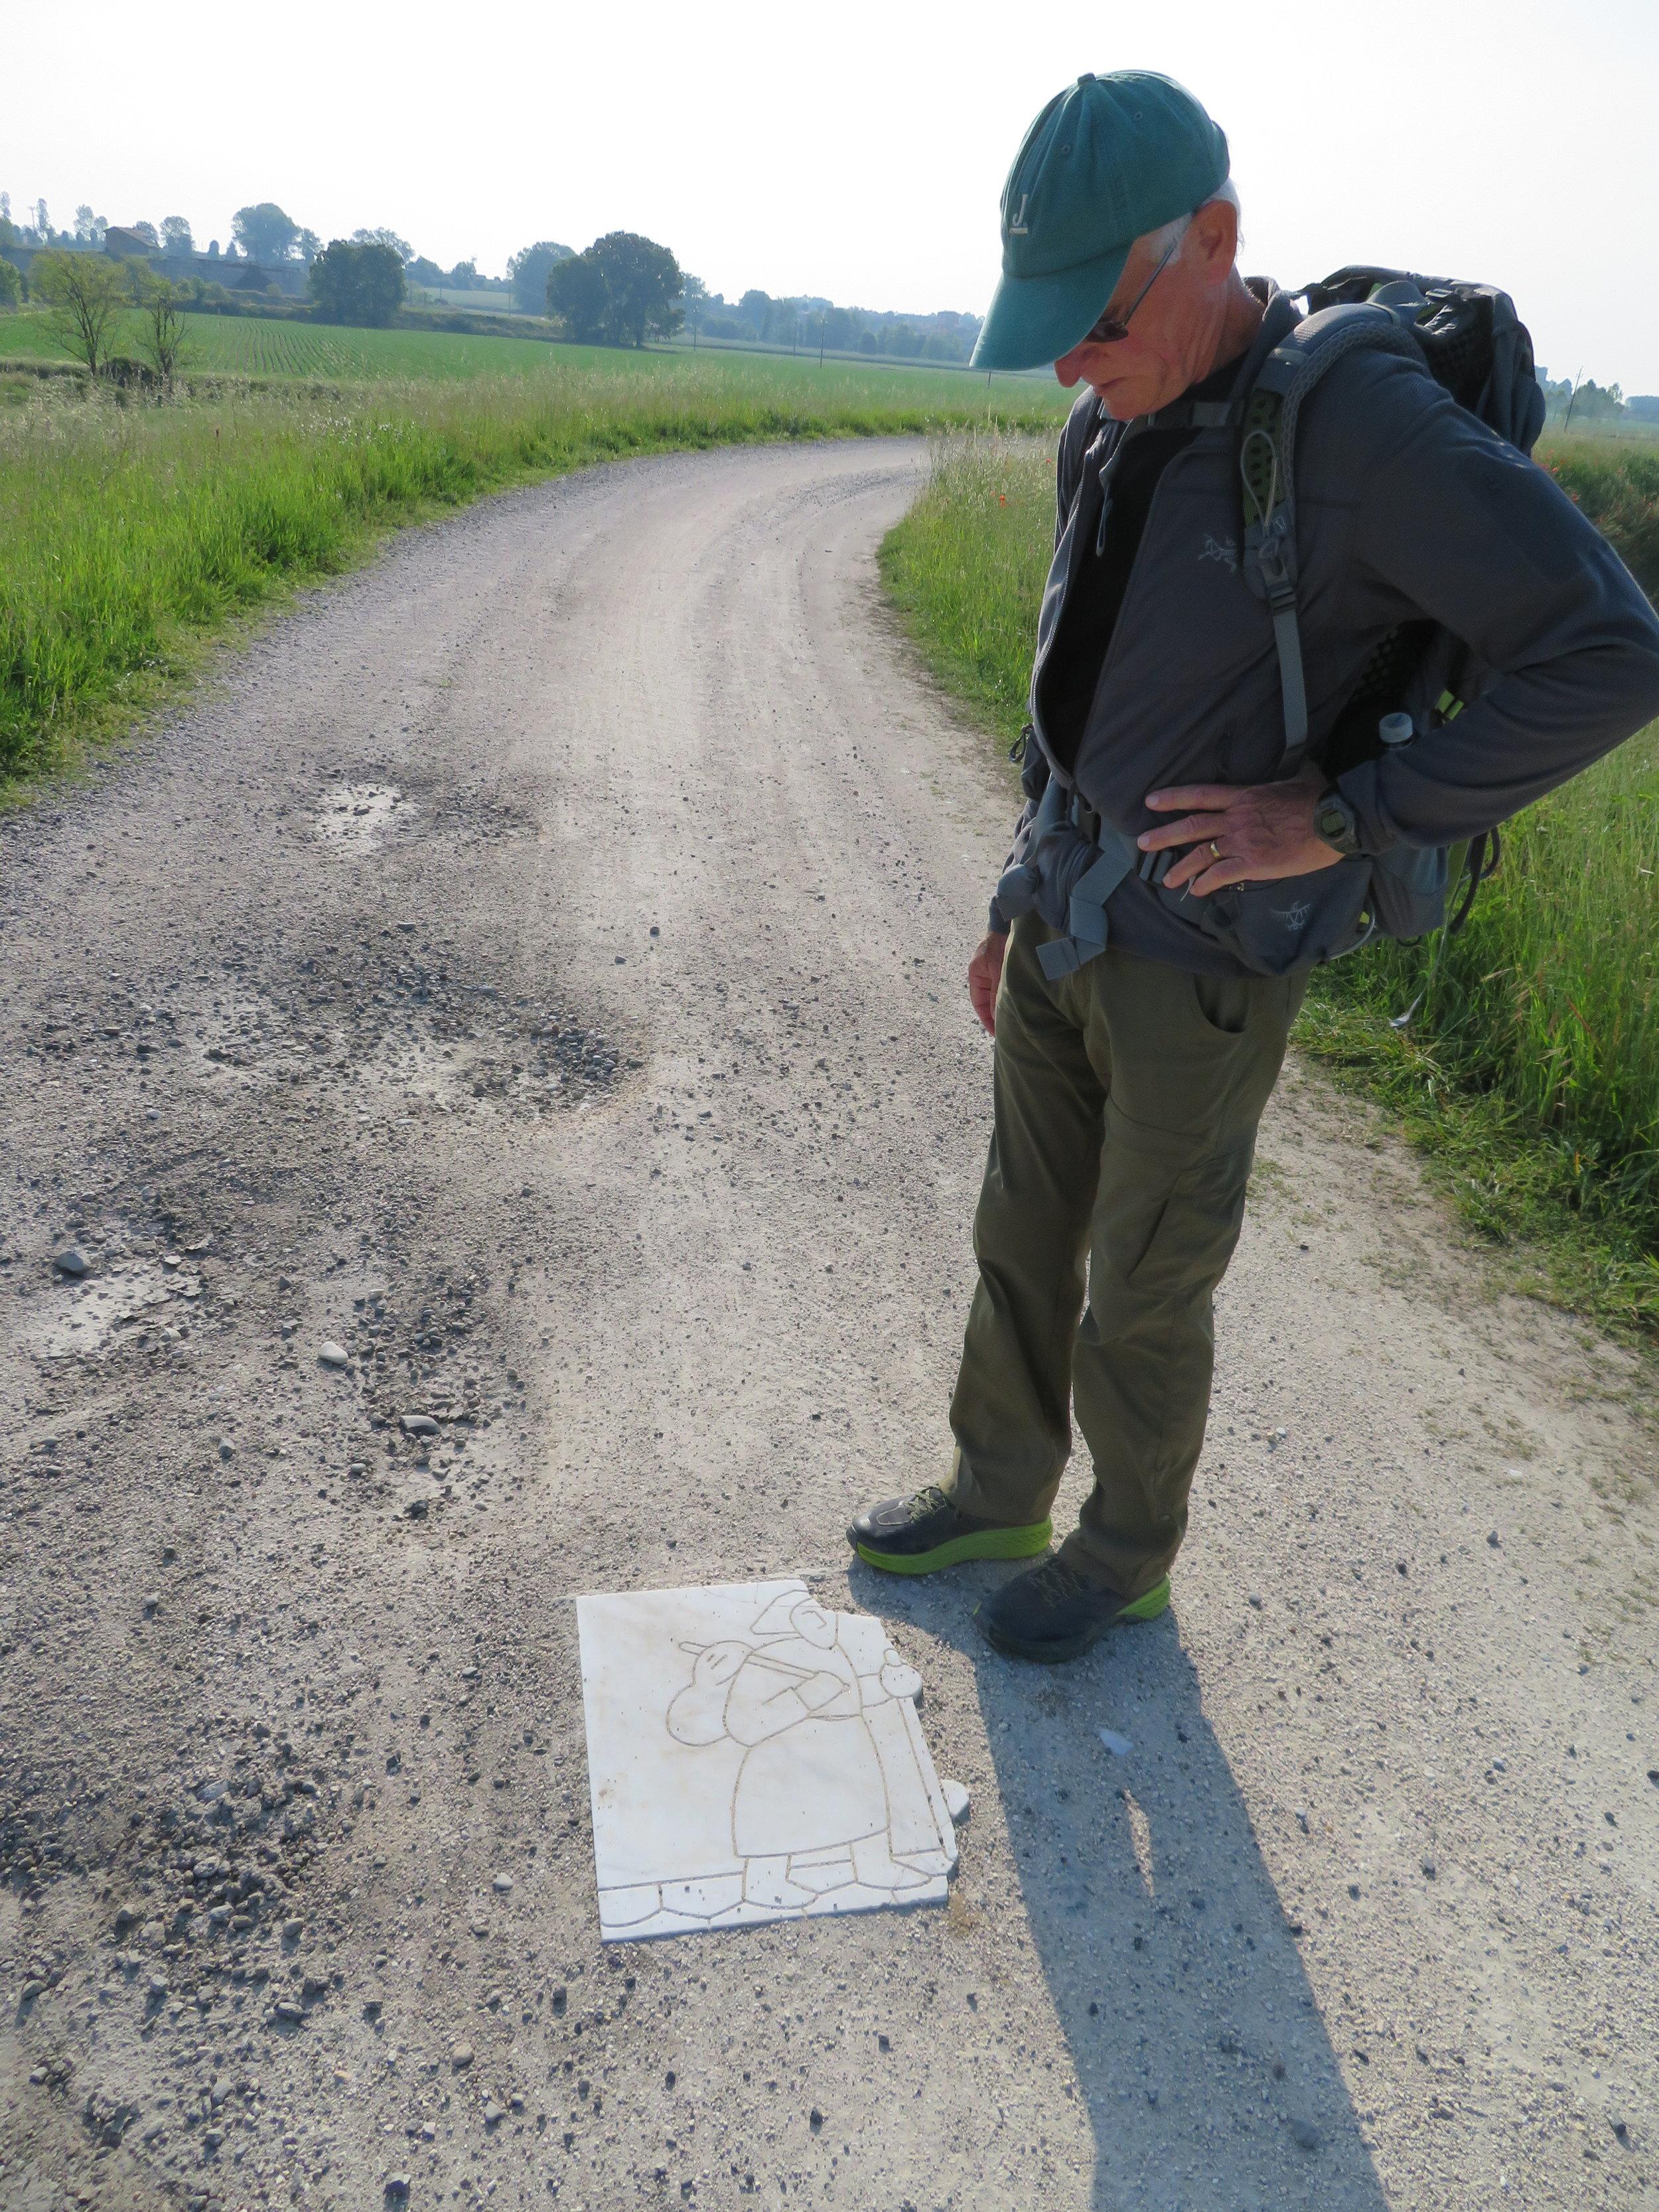 orio-santa cristina_VF marker on road.JPG